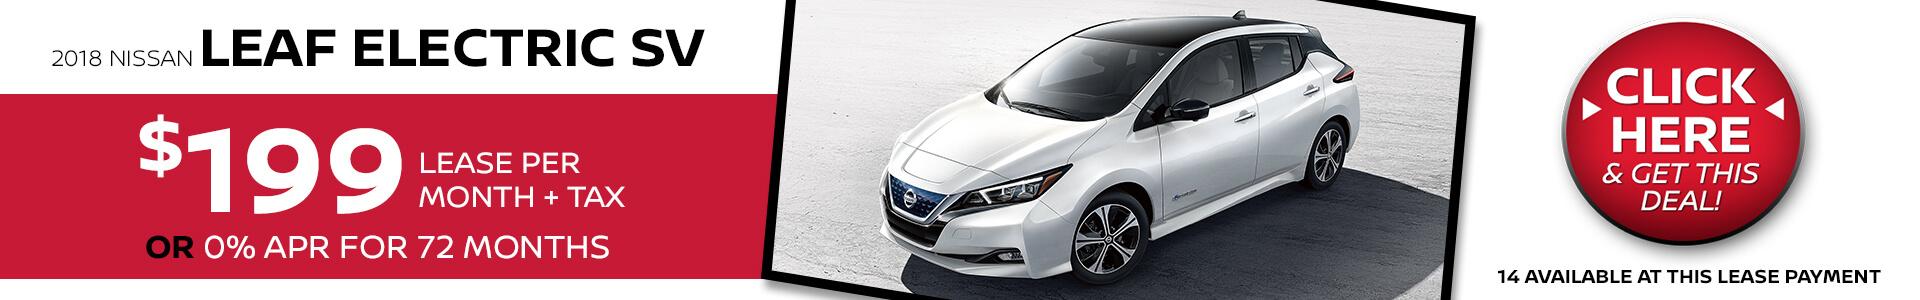 Nissan LEAF $199 Lease